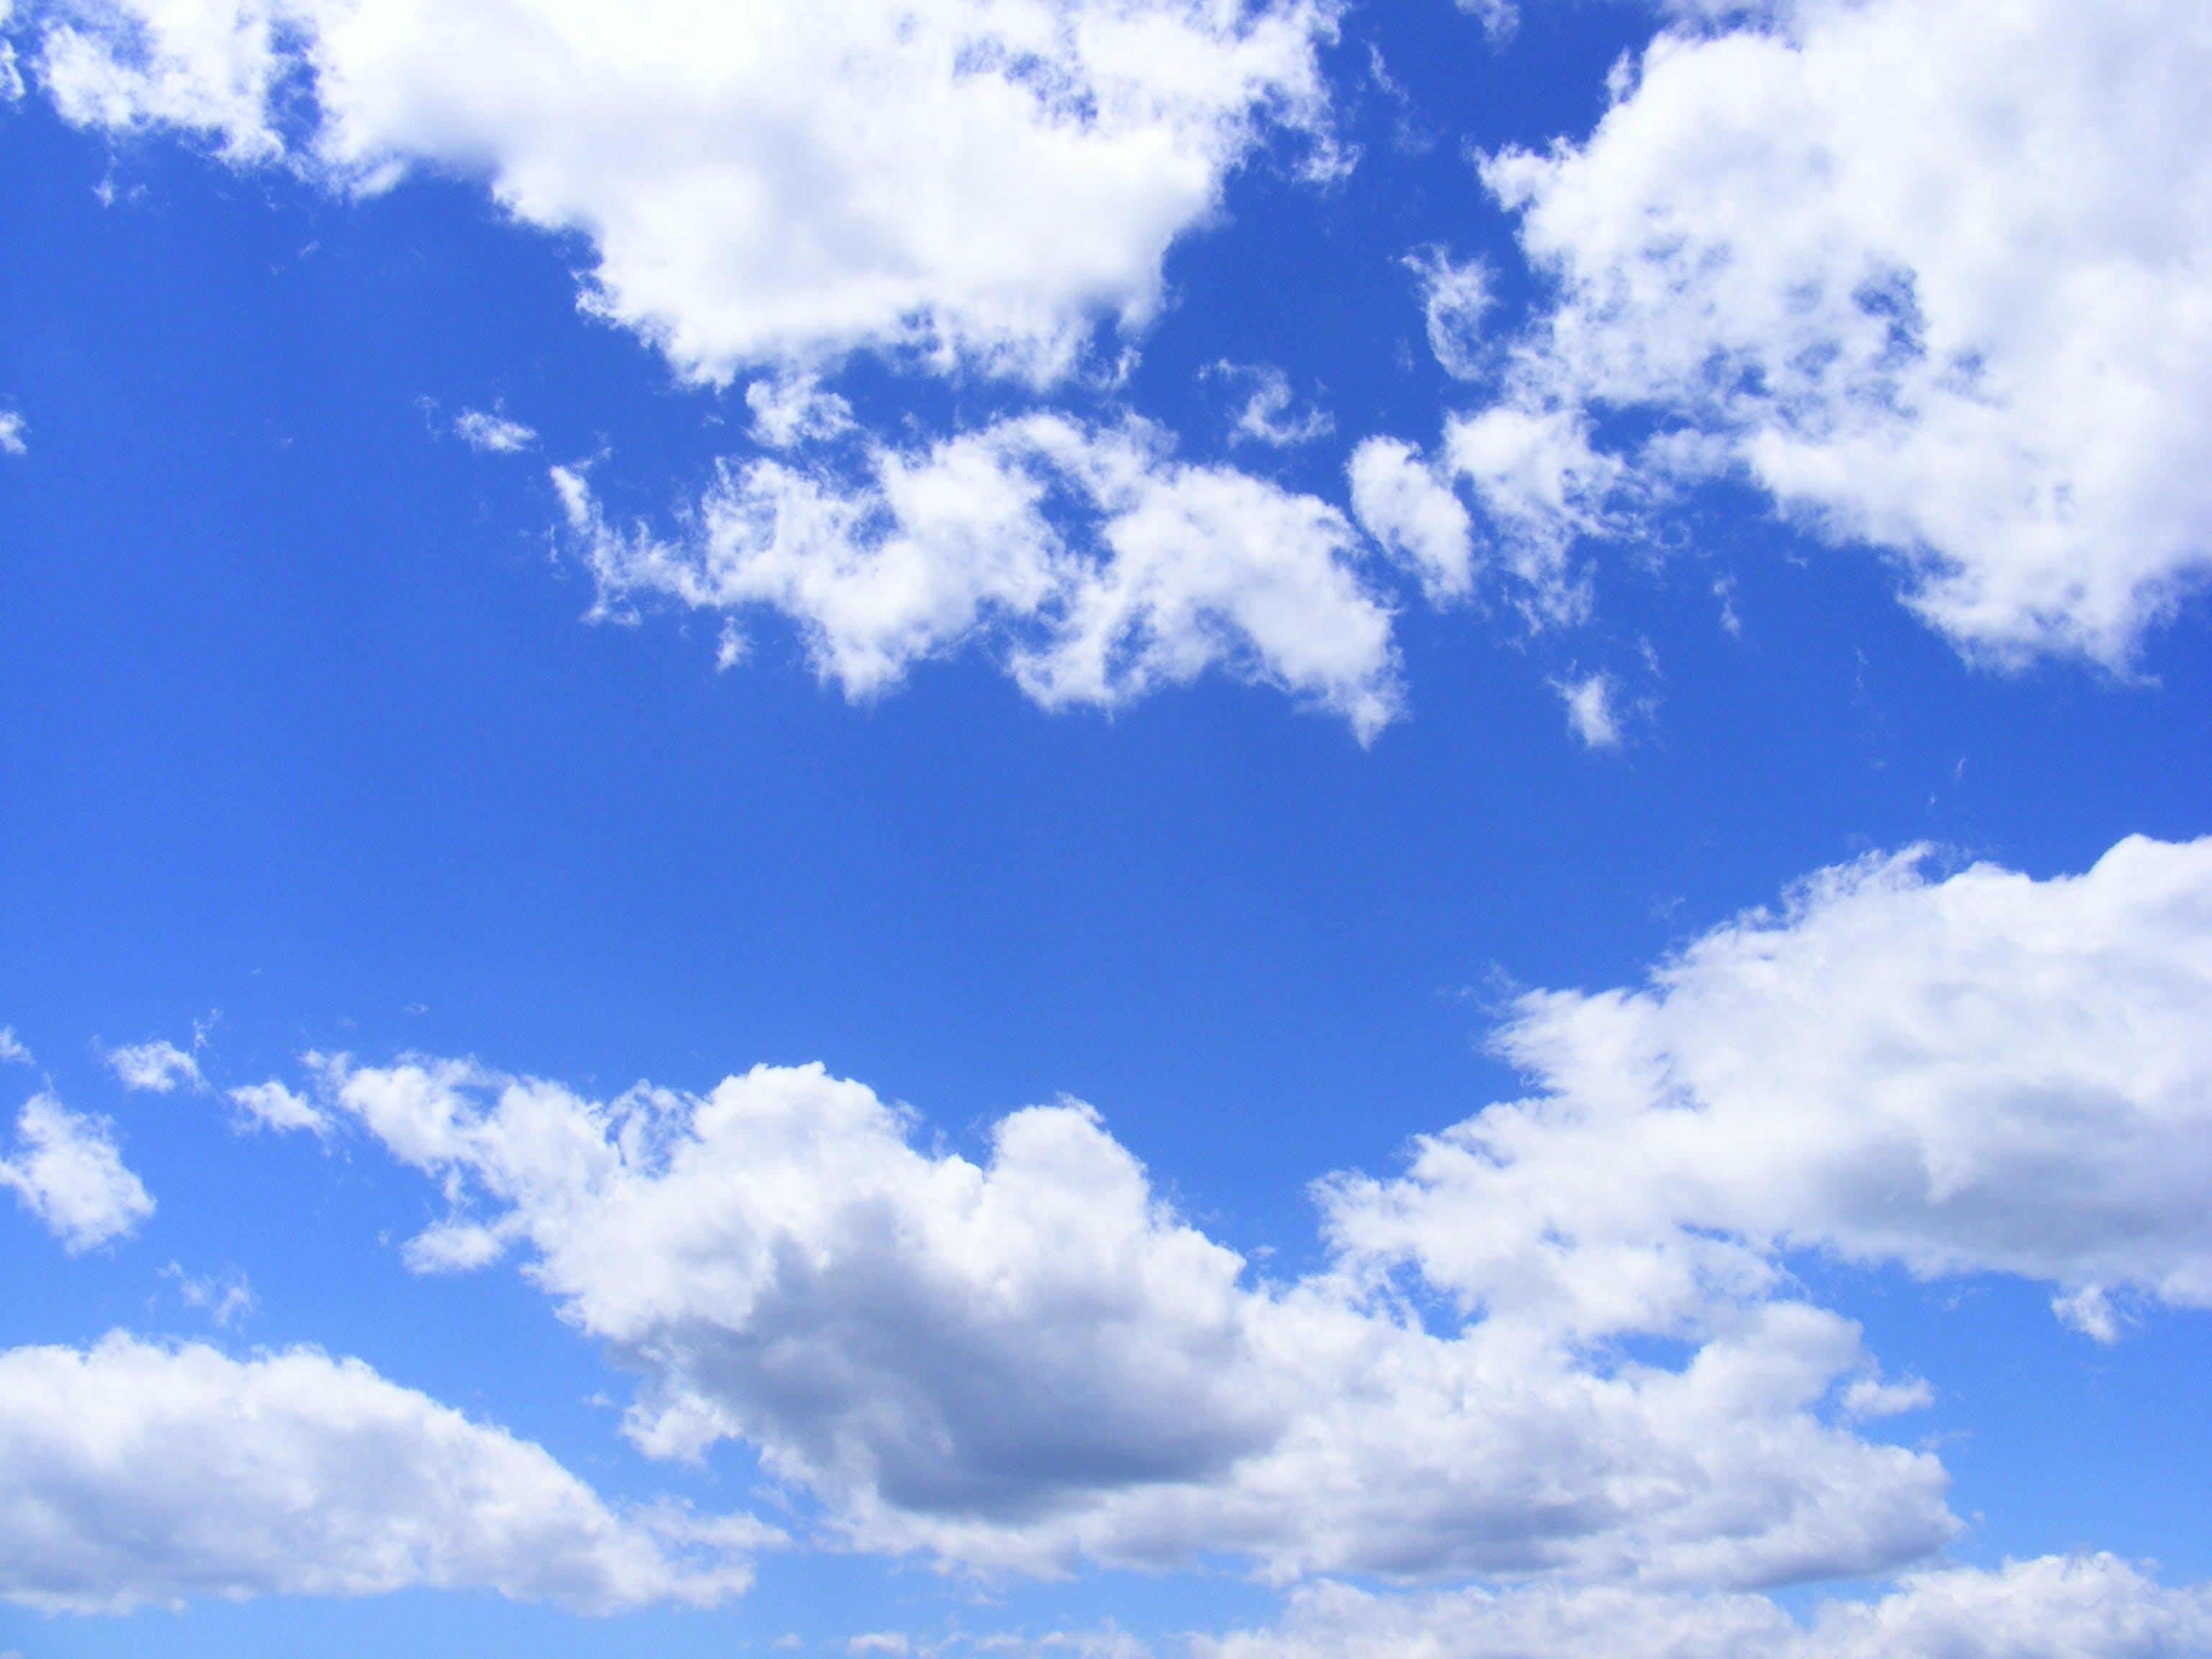 Foto stok gratis alam, awan, biru, gambar langit